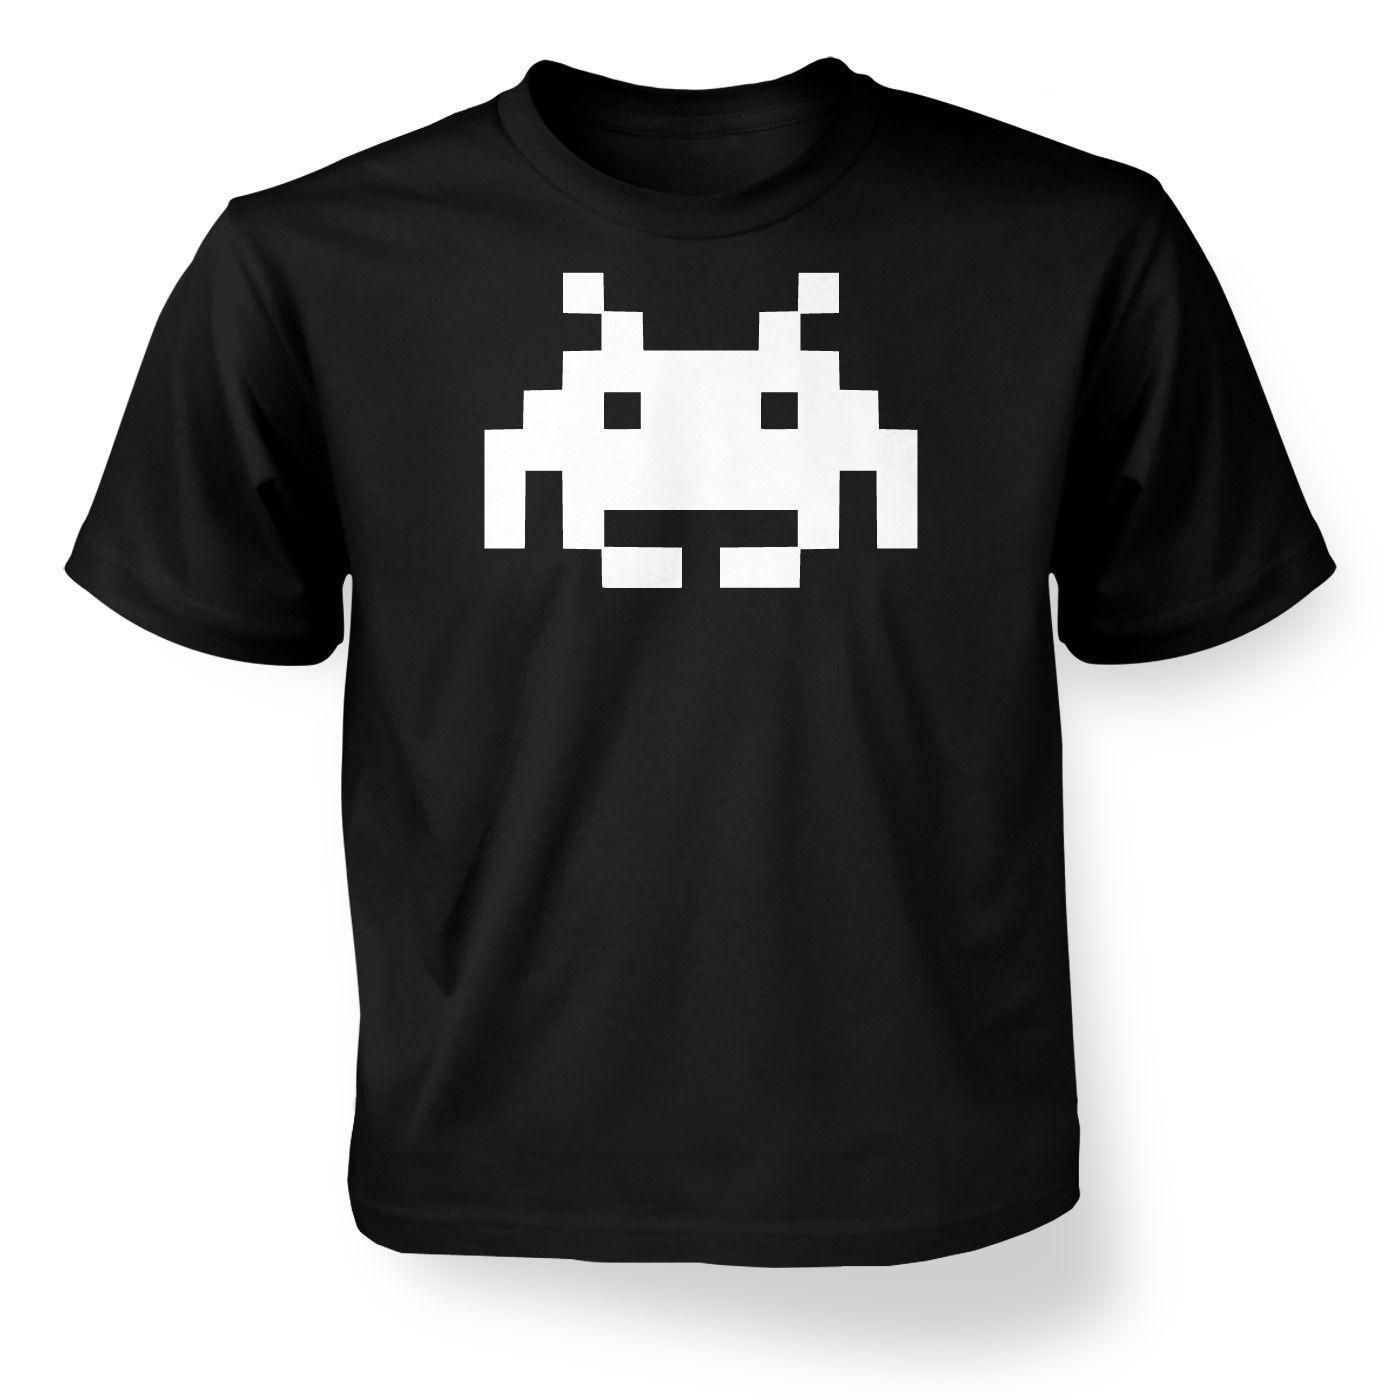 5a6eedf3 Alien Invader Pixel Art kids t-shirt - Somethinggeeky